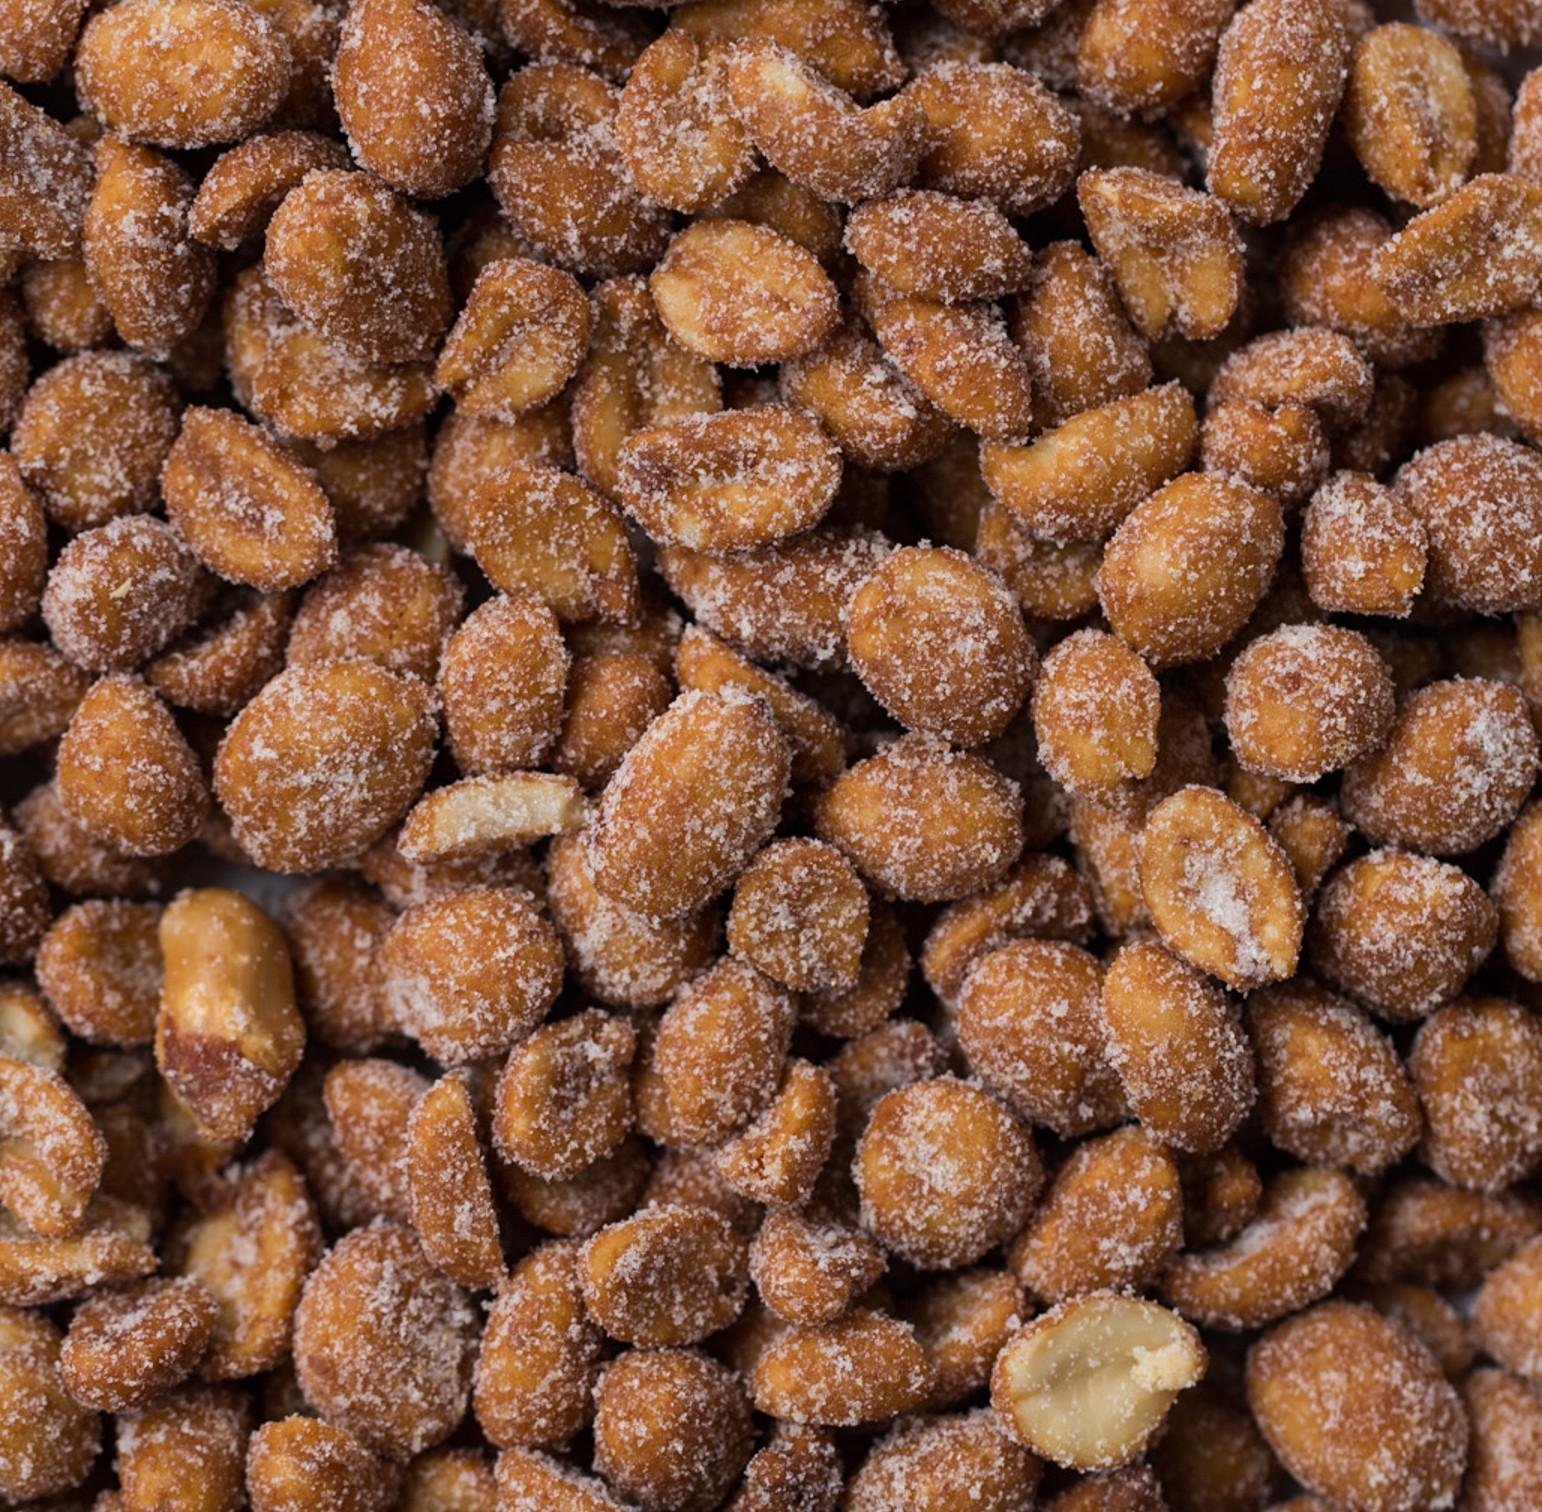 Honey Roasted Peanuts | Sweet City Candy